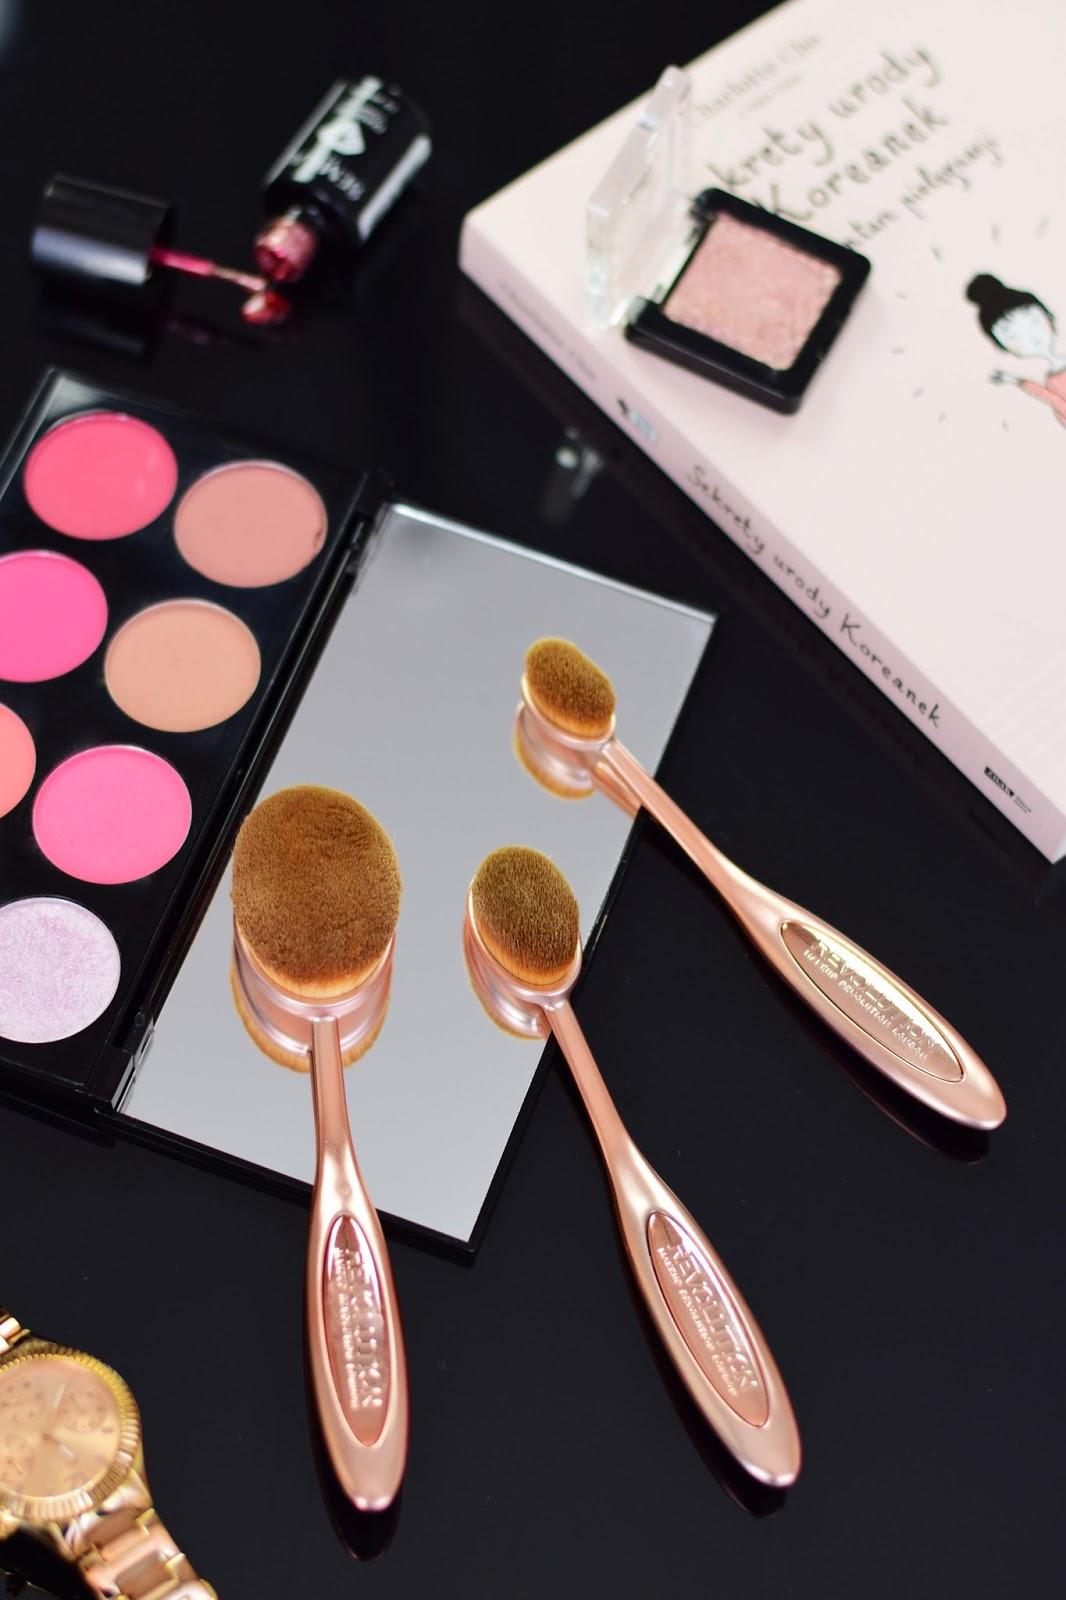 makeup_revolution_precision_contour_set_zestaw_szczotek_do_makijazu_twarzy_opinie_blog